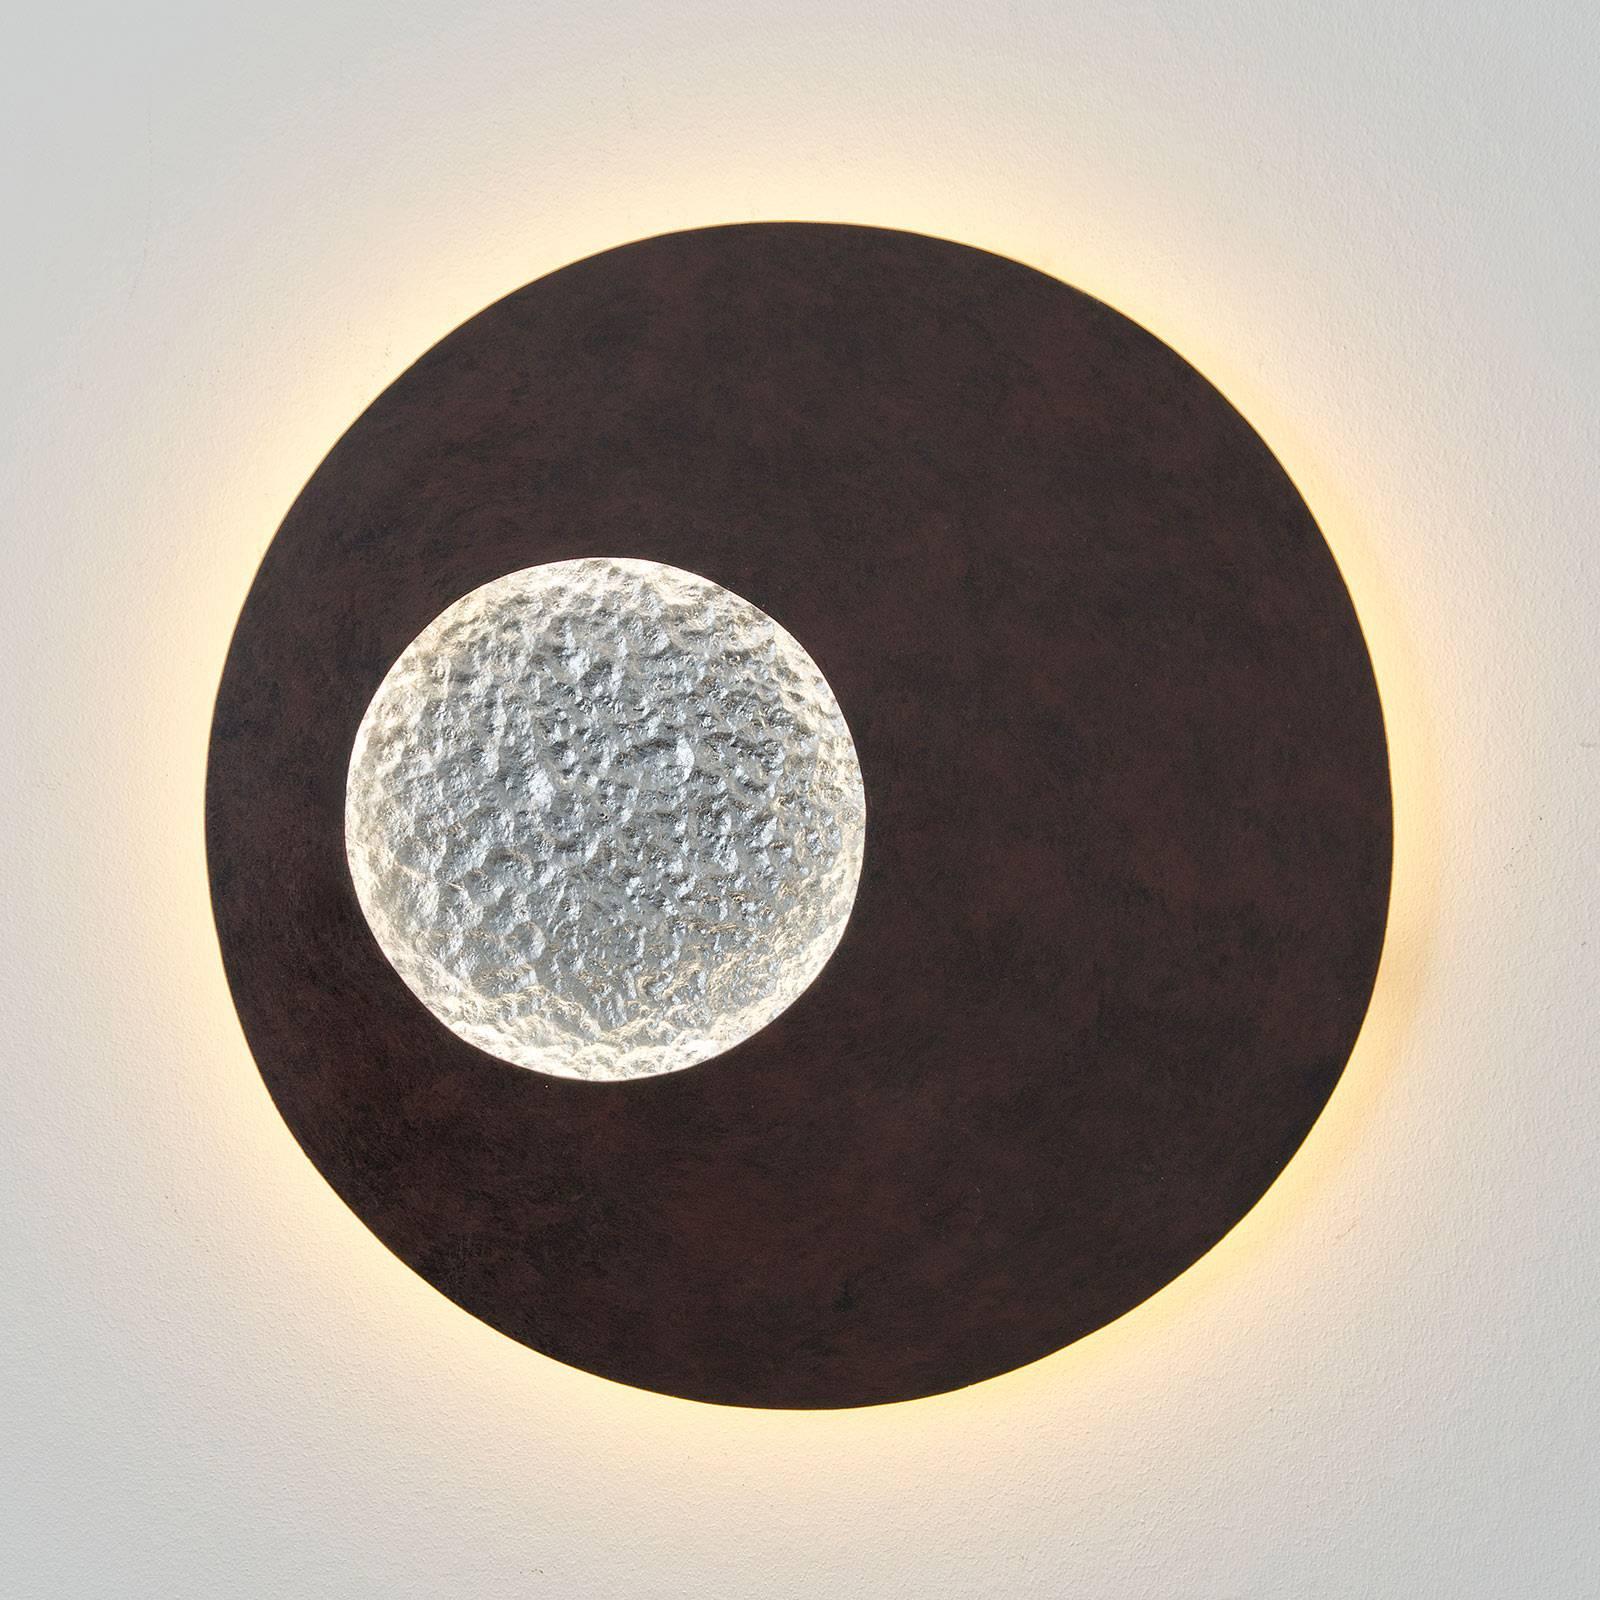 LED wandlamp Luina, Ø 40 cm, binnen zilver